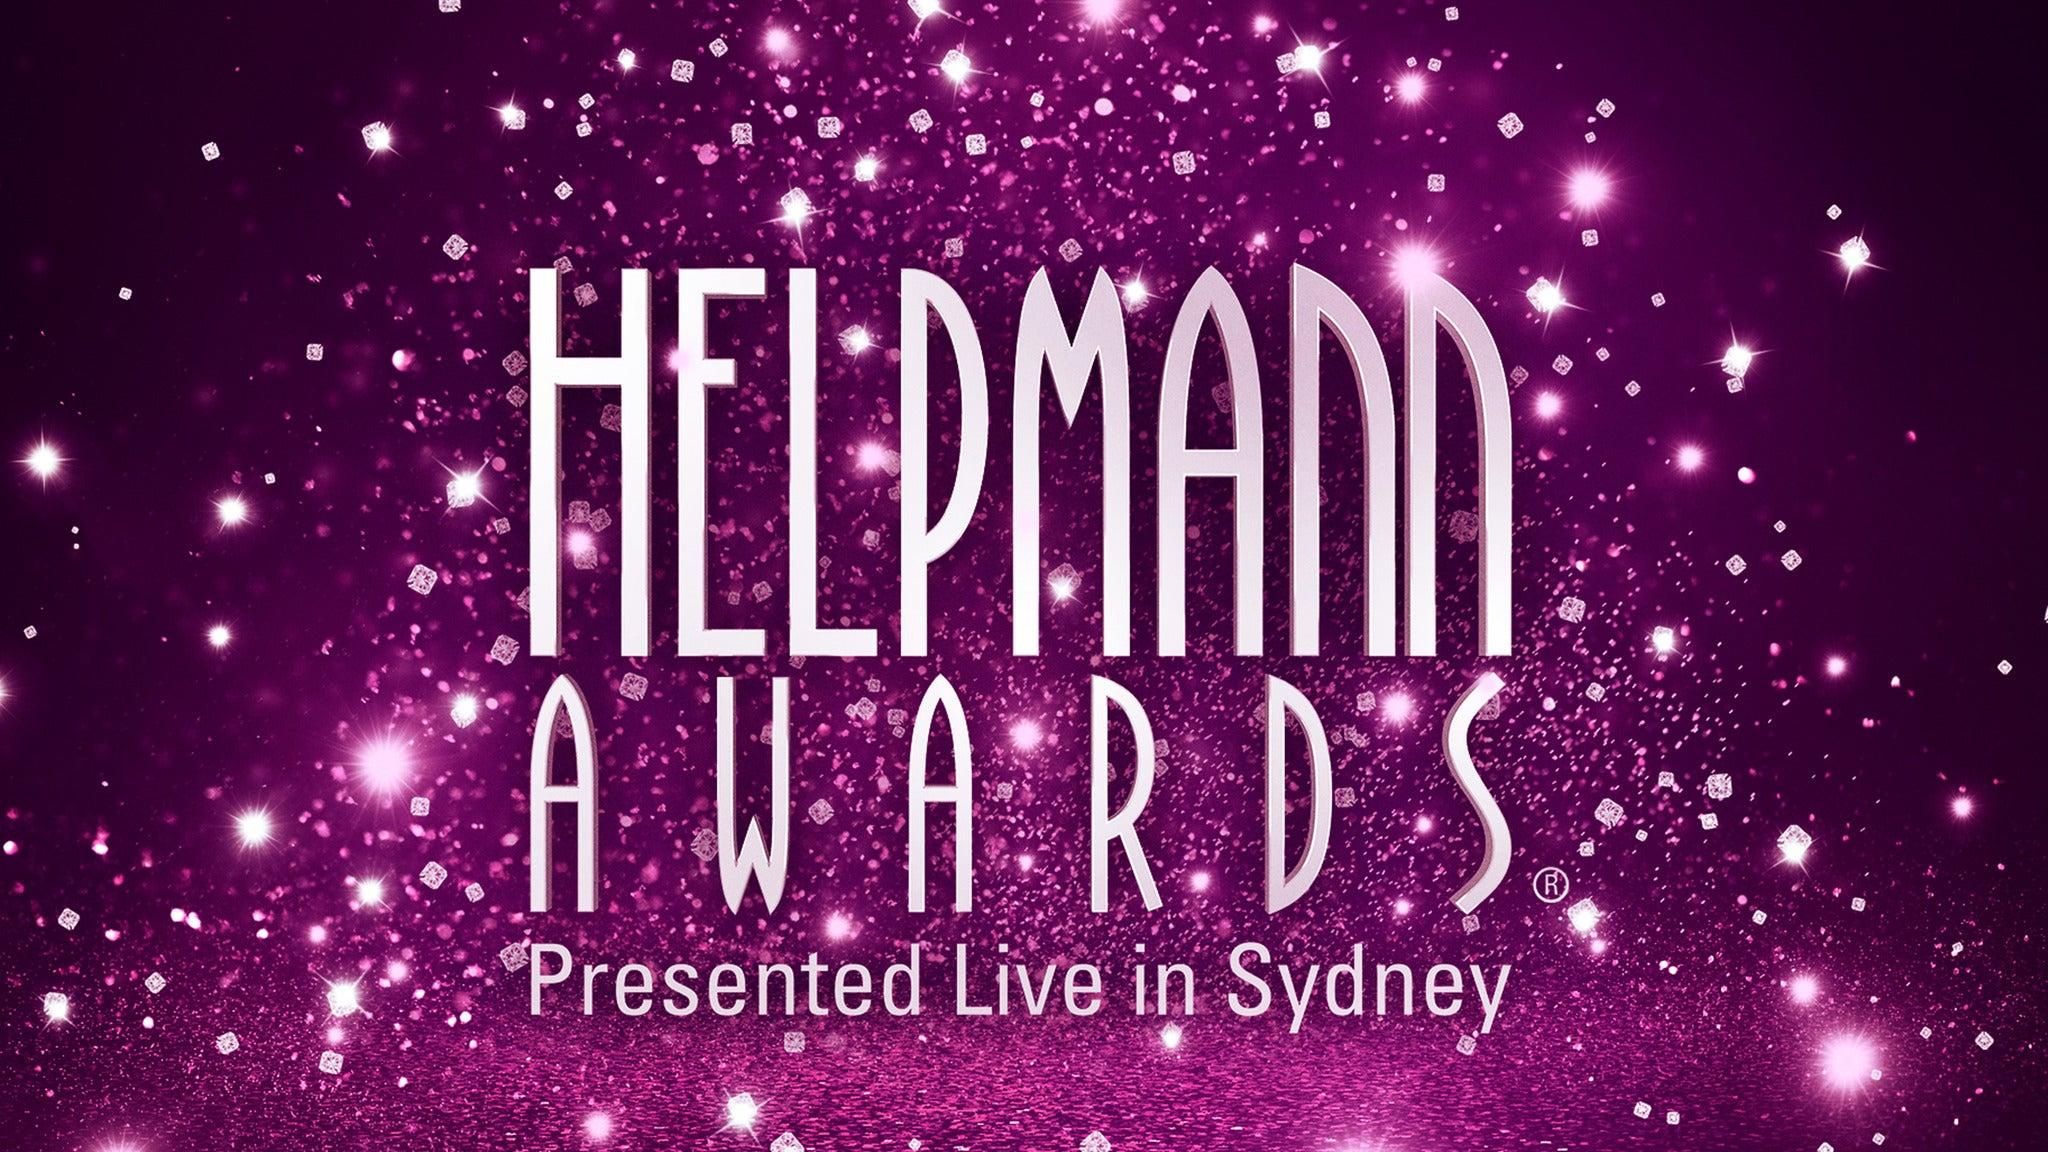 2018 Helpmann Awards Act II